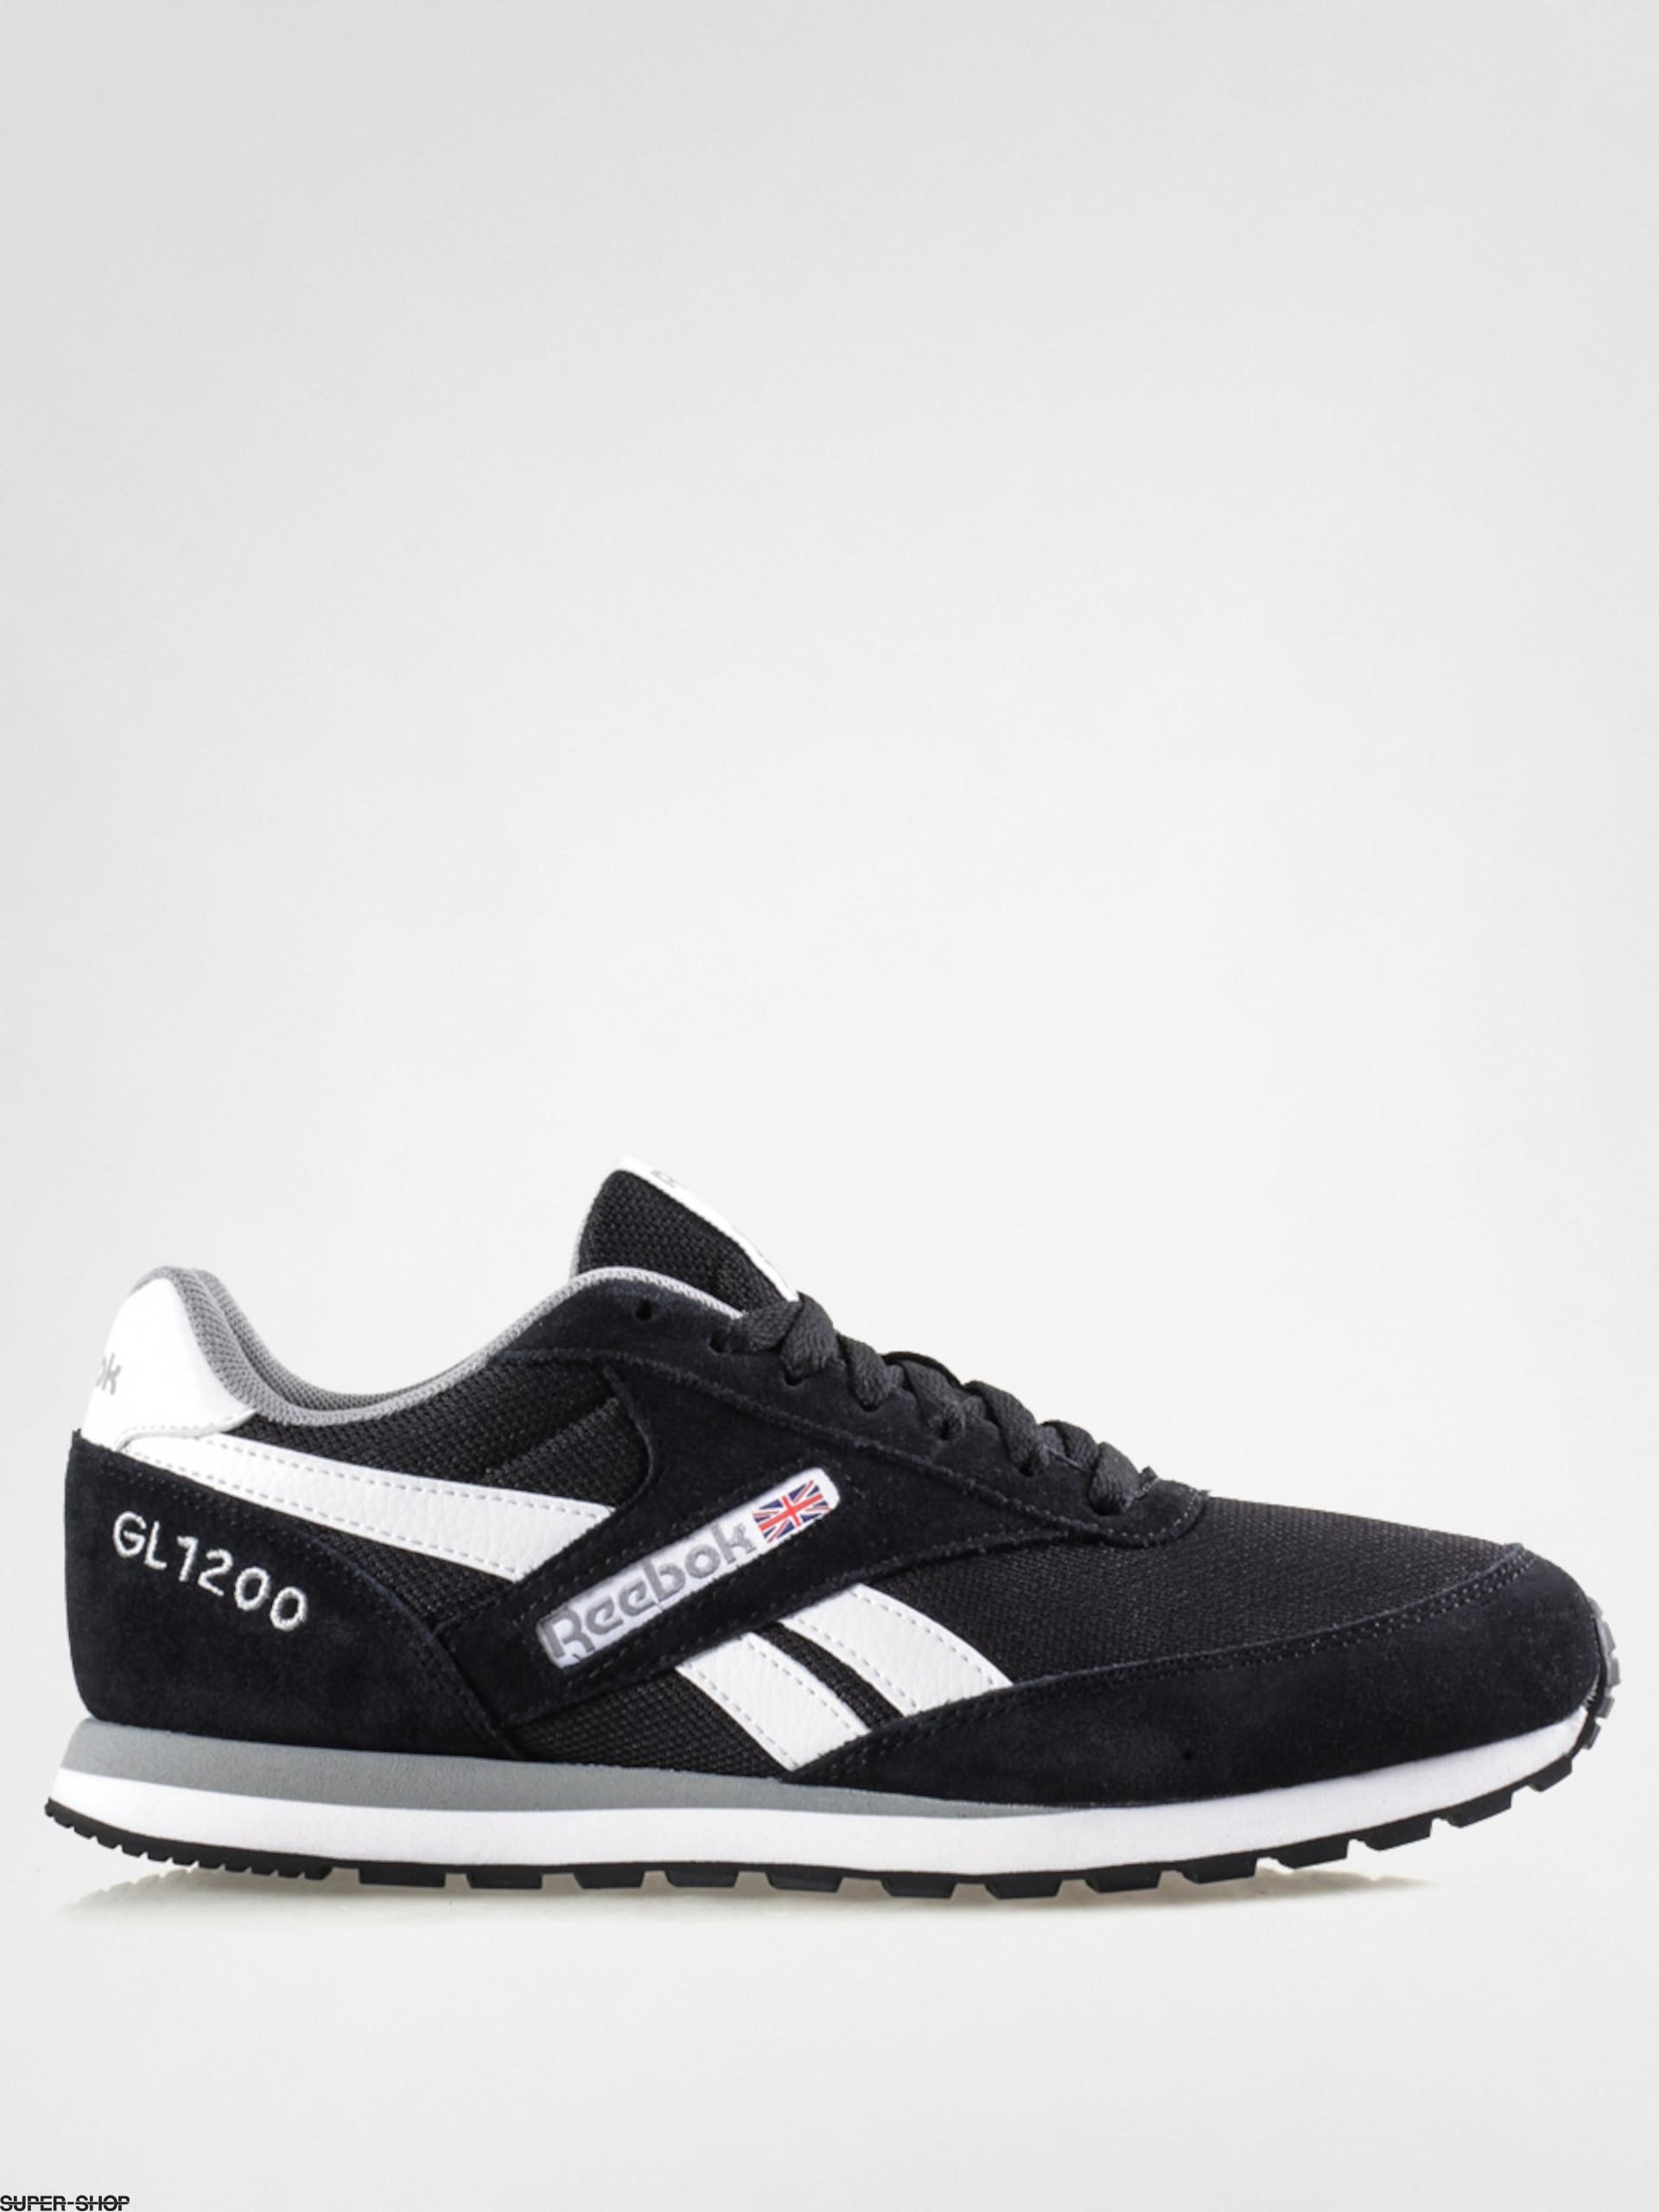 Reebok Shoes Gl 1200 (blackflat grey